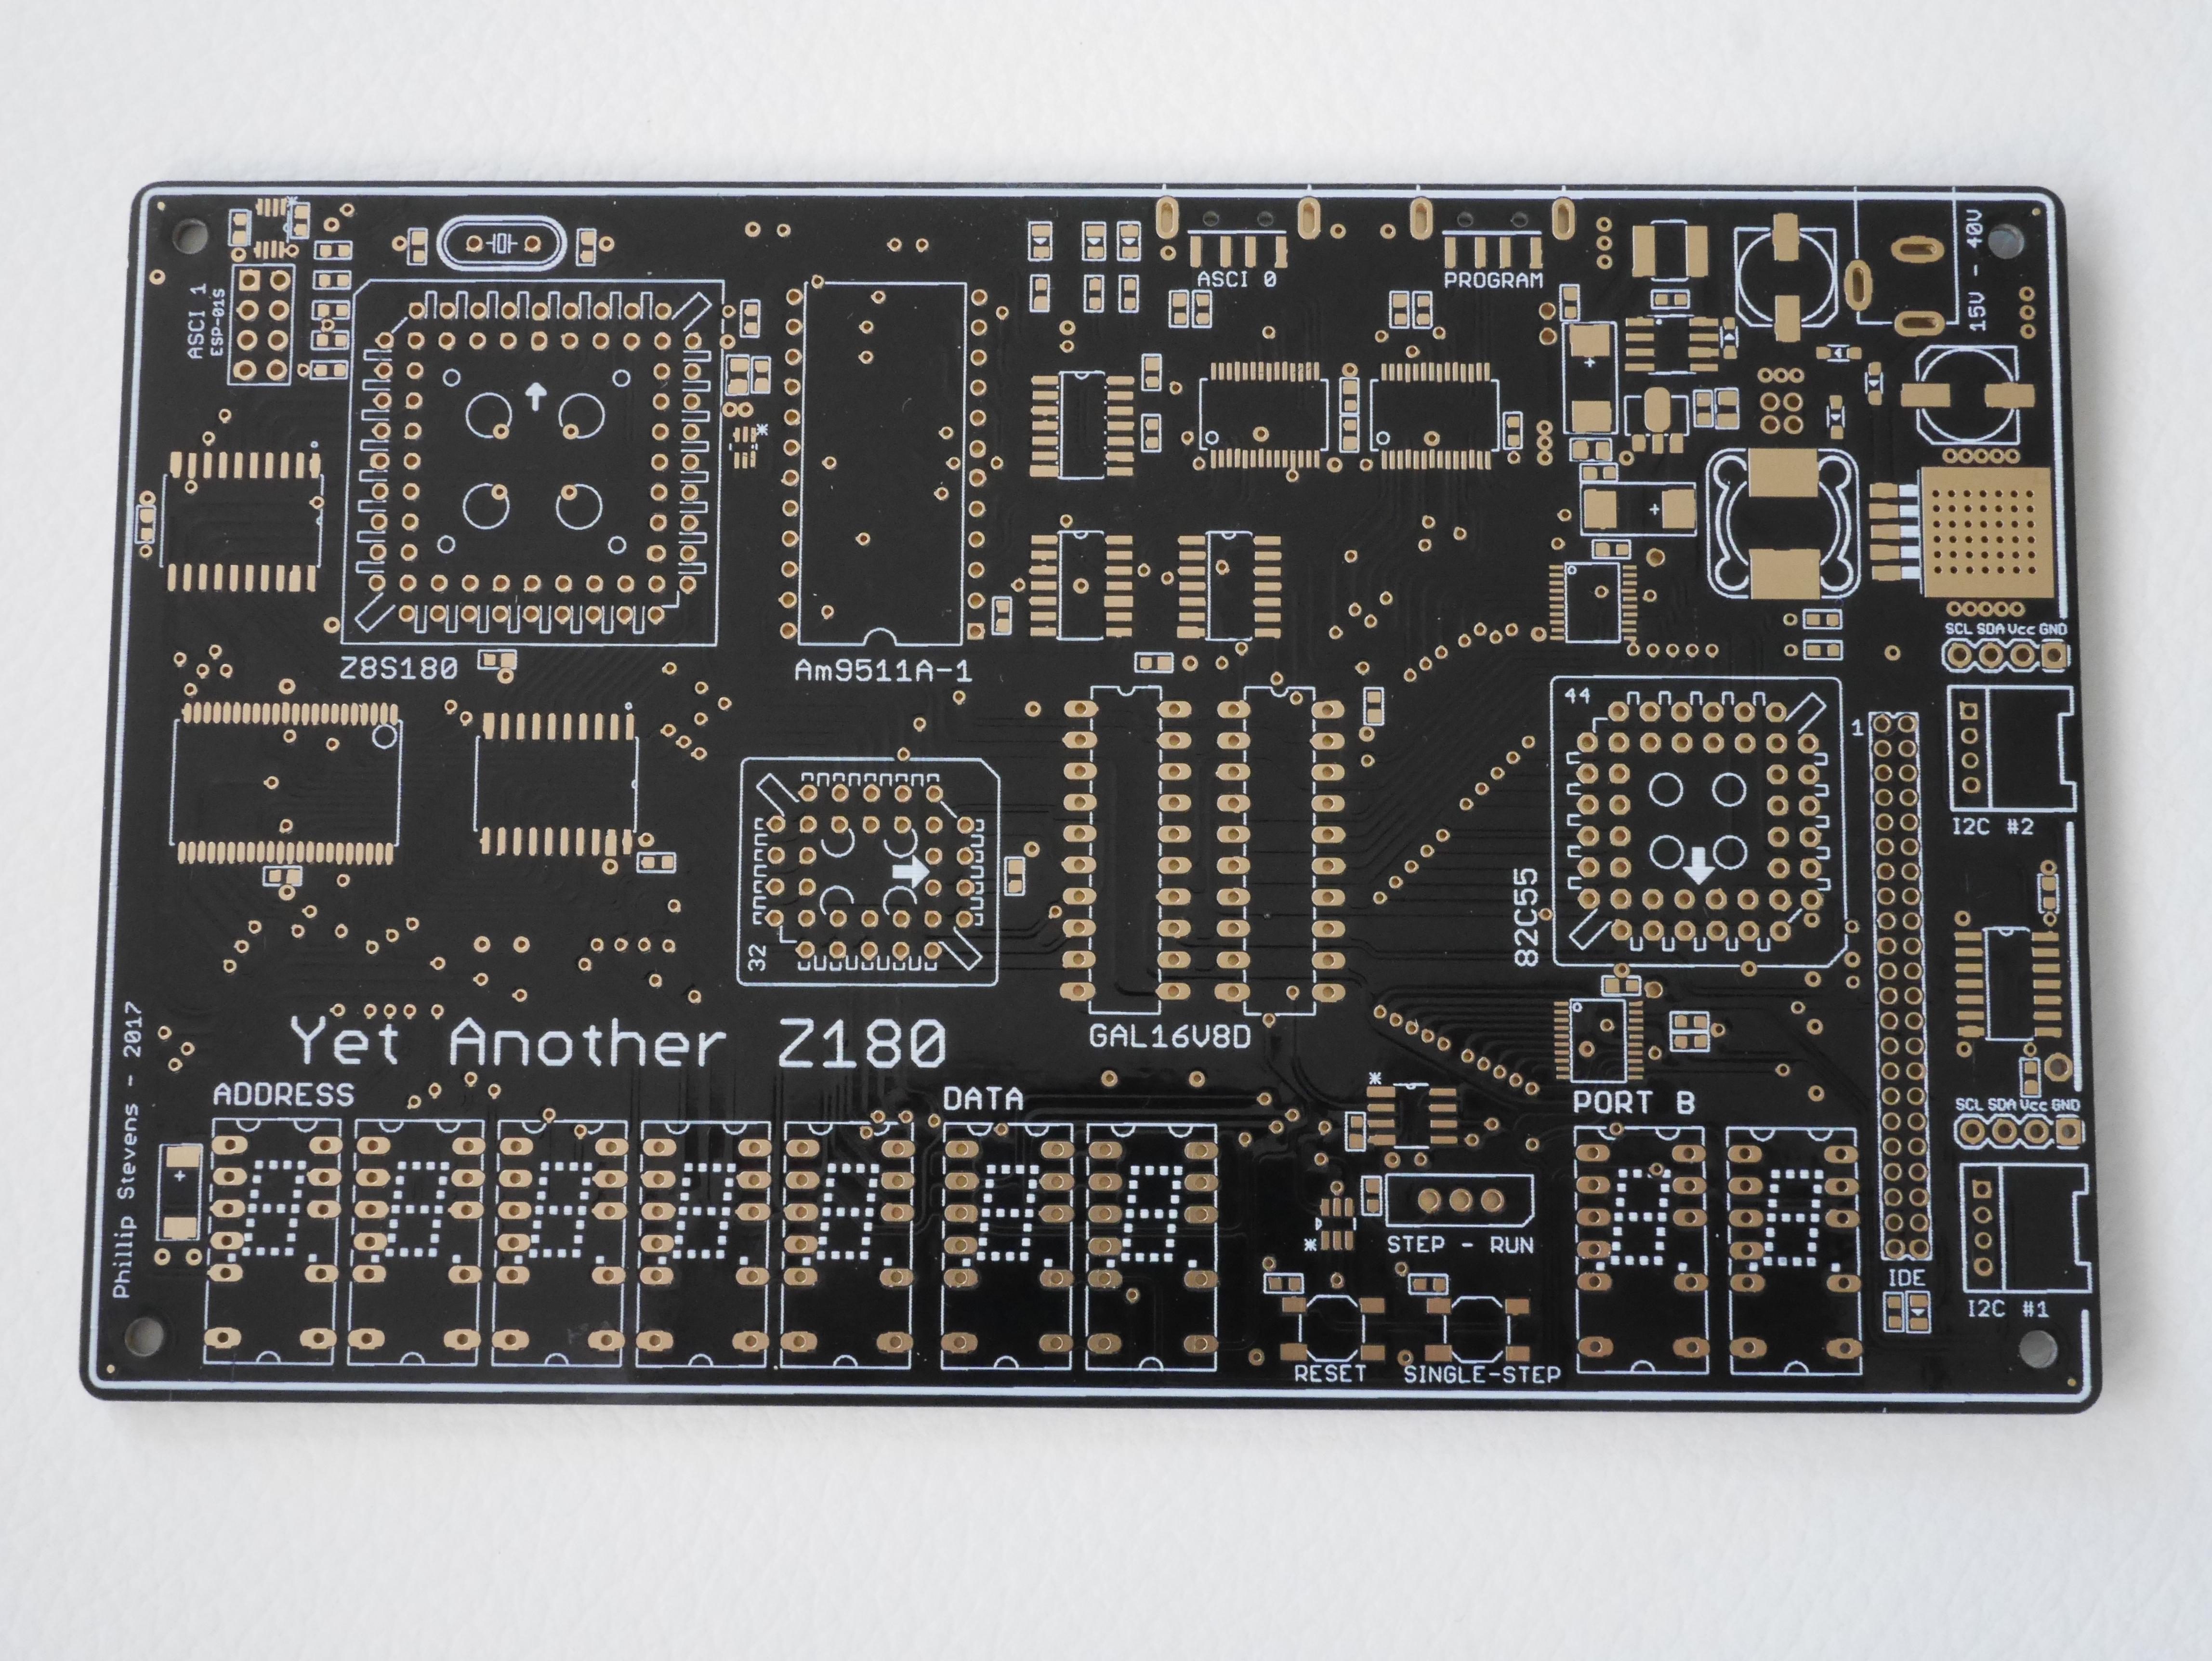 Feilipu Stuff I Need To Write Down 1440 Breadboard Solder Finished Prototype For Pcb Circuit Board Ebay V21